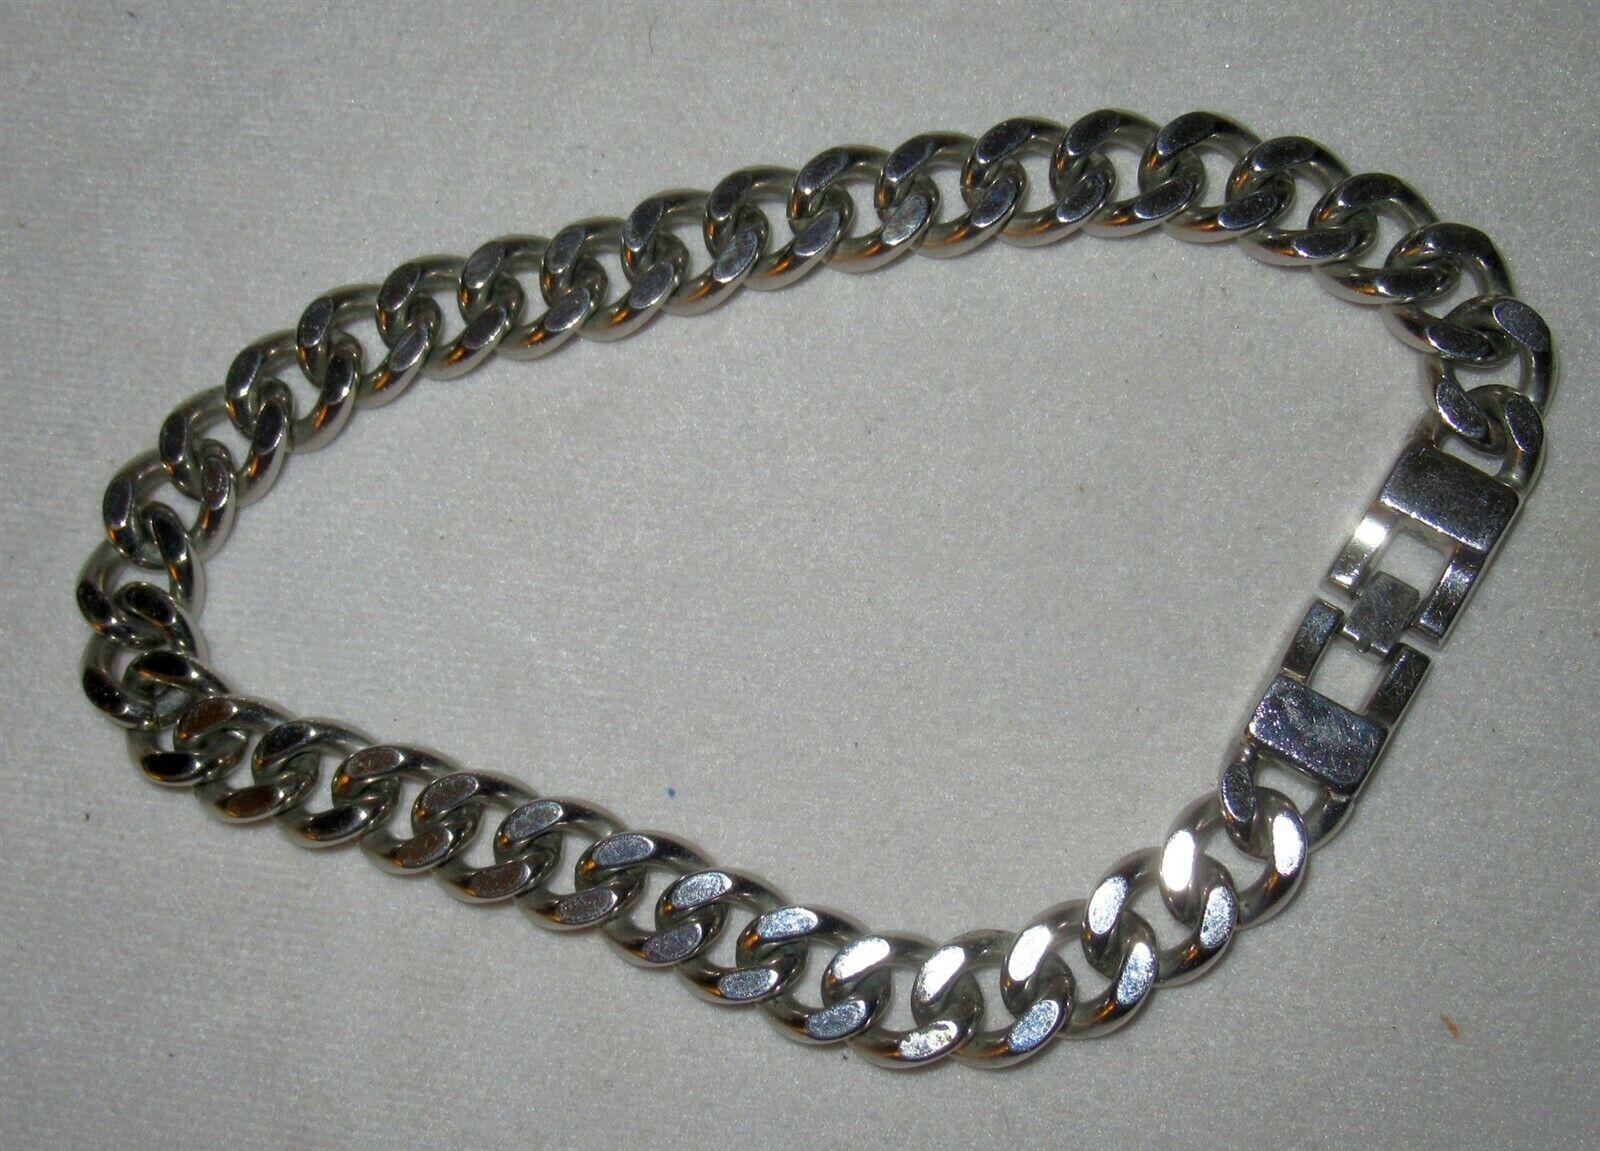 Monet Heavy Silver Tone Cuban Curb Link Boot Ankle Bracelet Shoe Jewelry